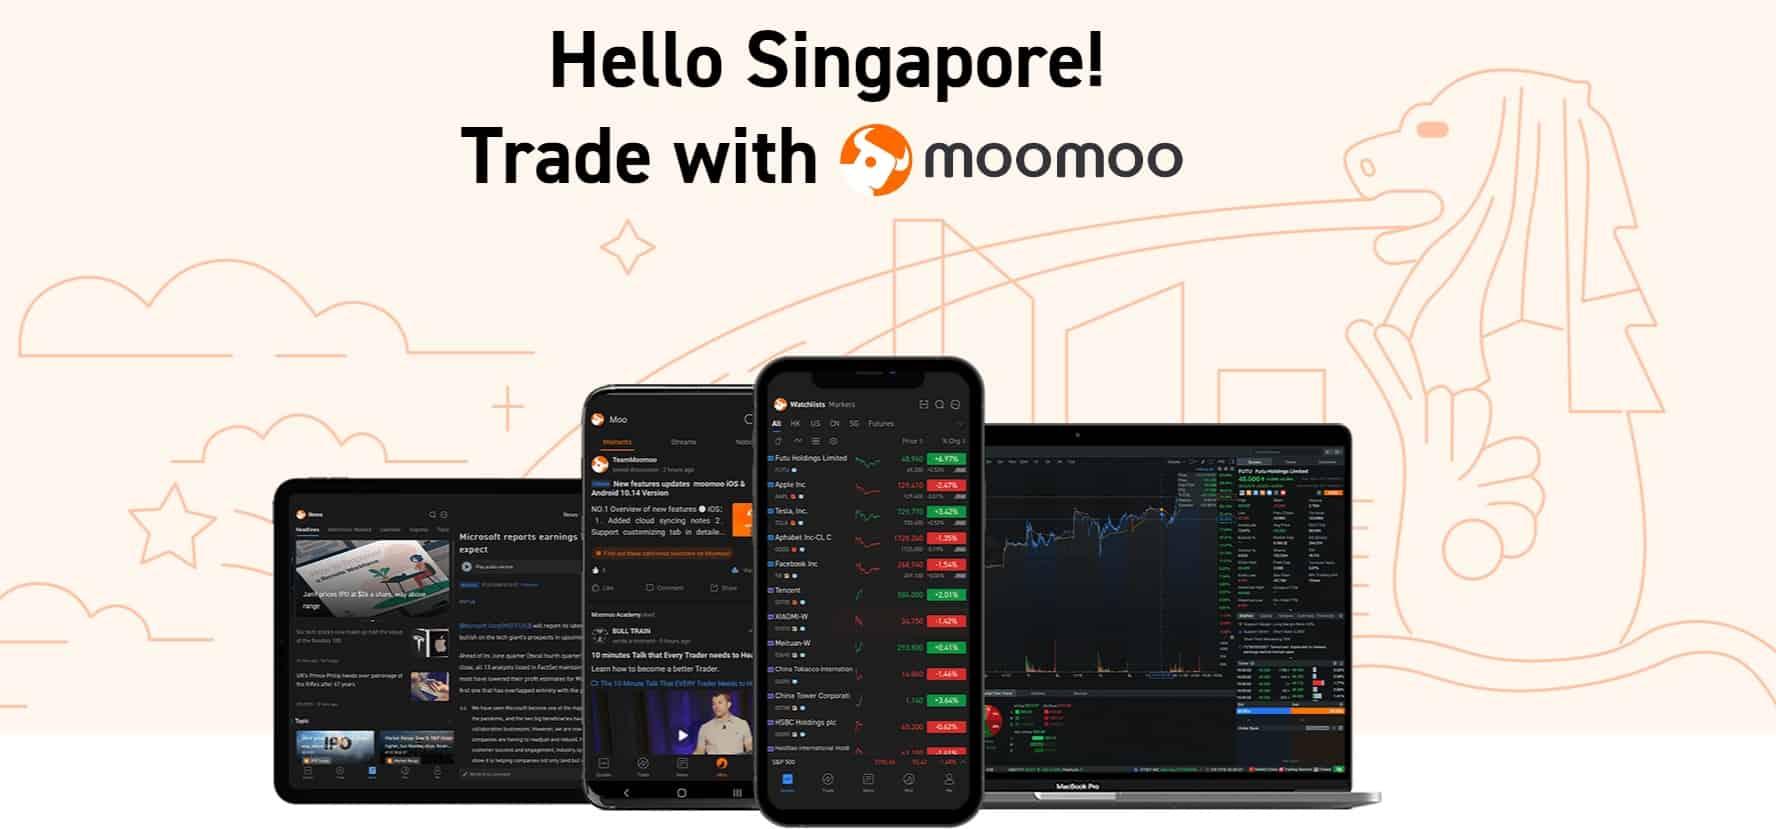 low-cost-online-brokerage-platform-moomoo-futu-singapore